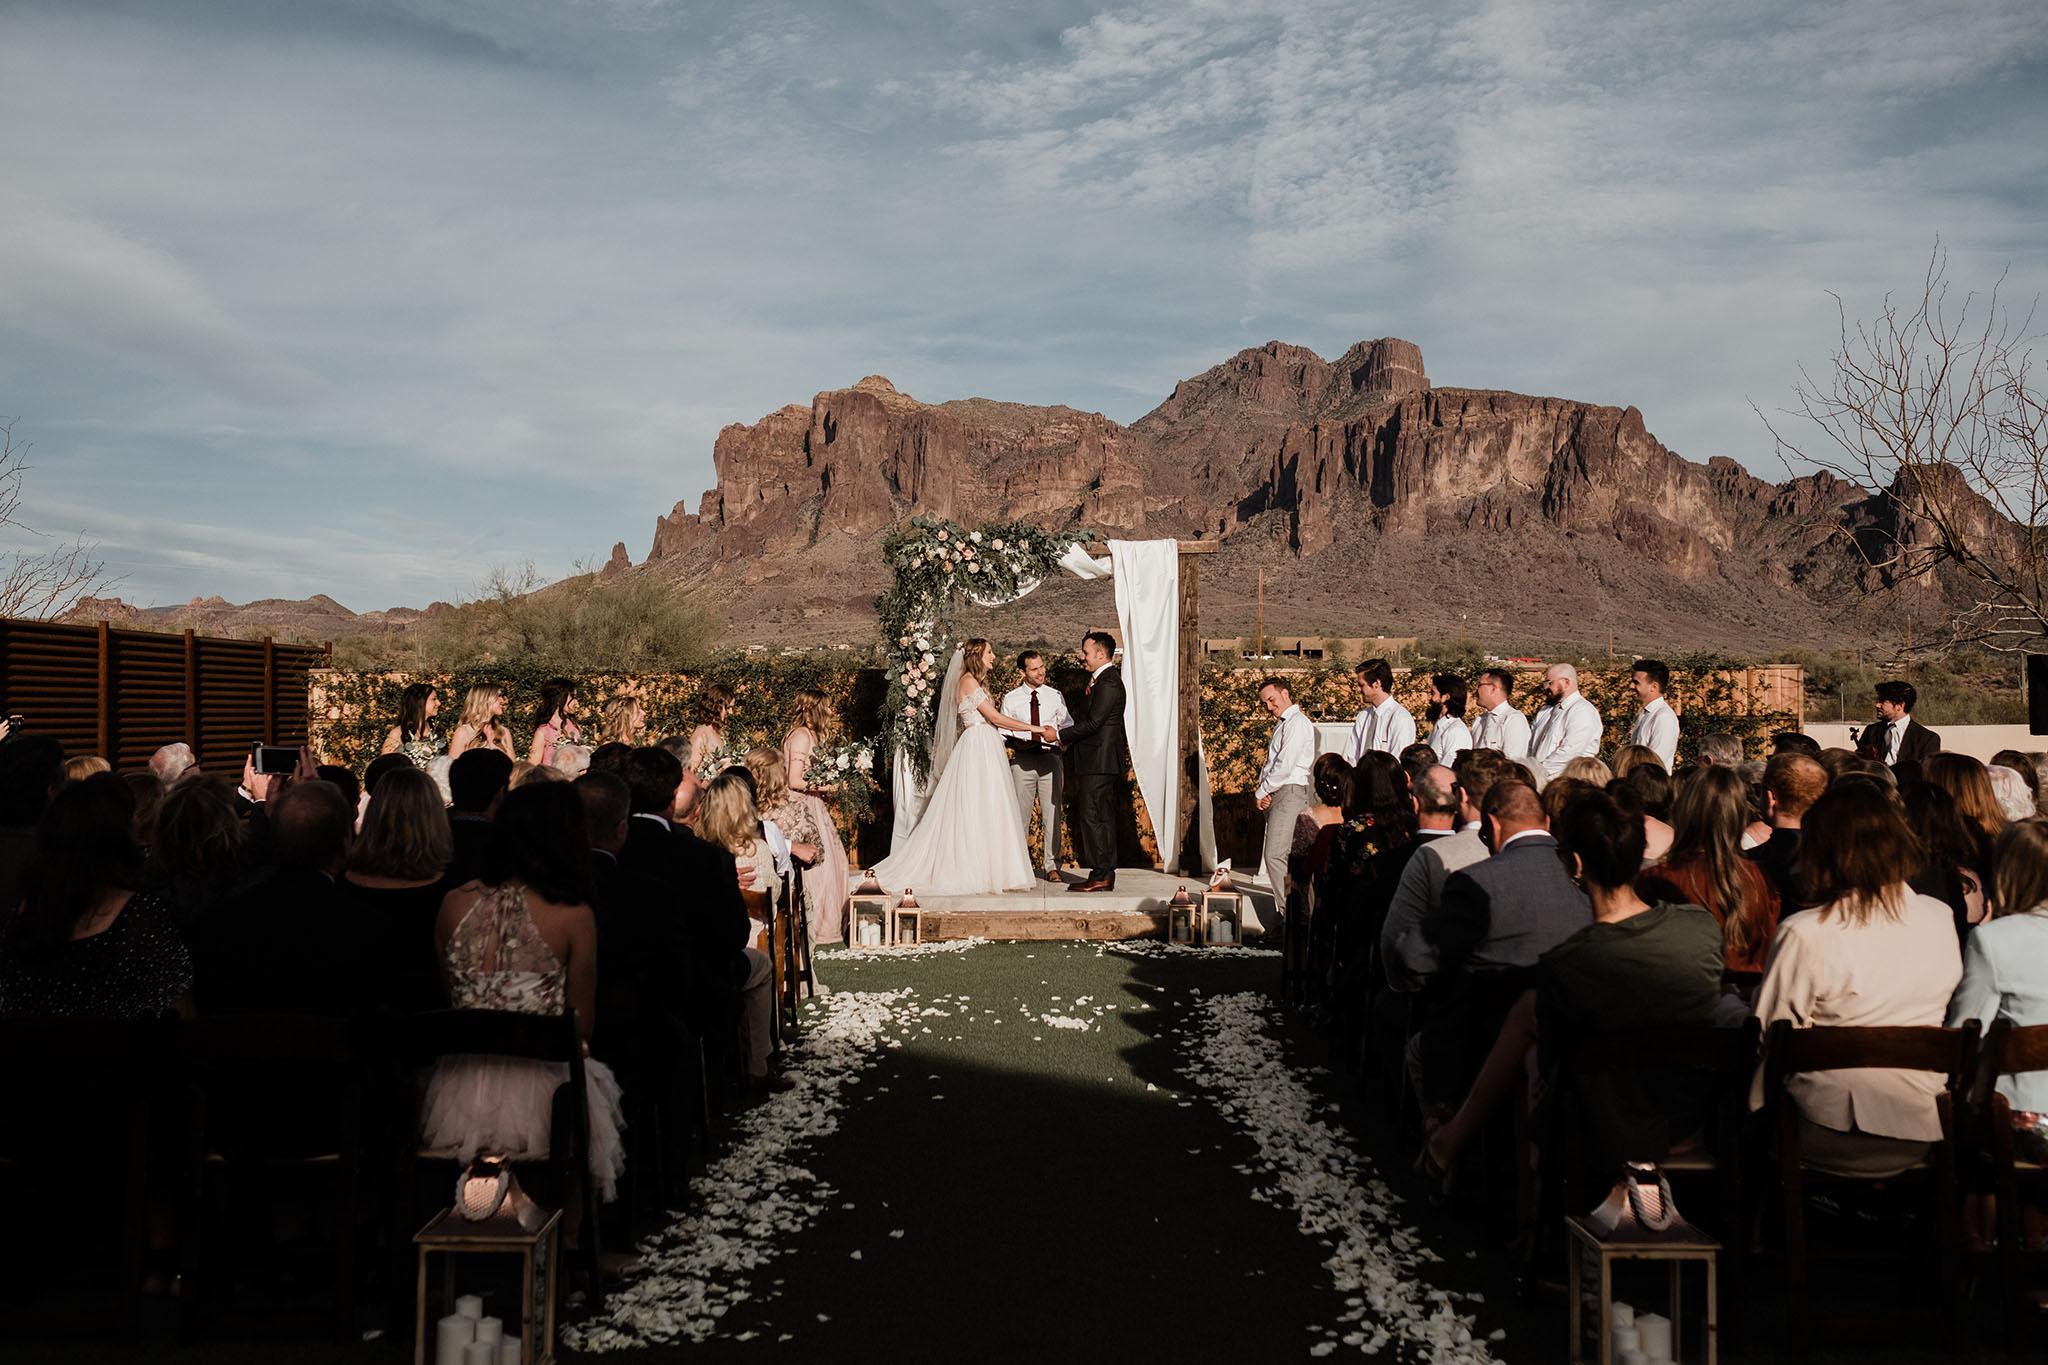 Arizona-Wedding-Photographer-The-Paseo-Venue18.jpg